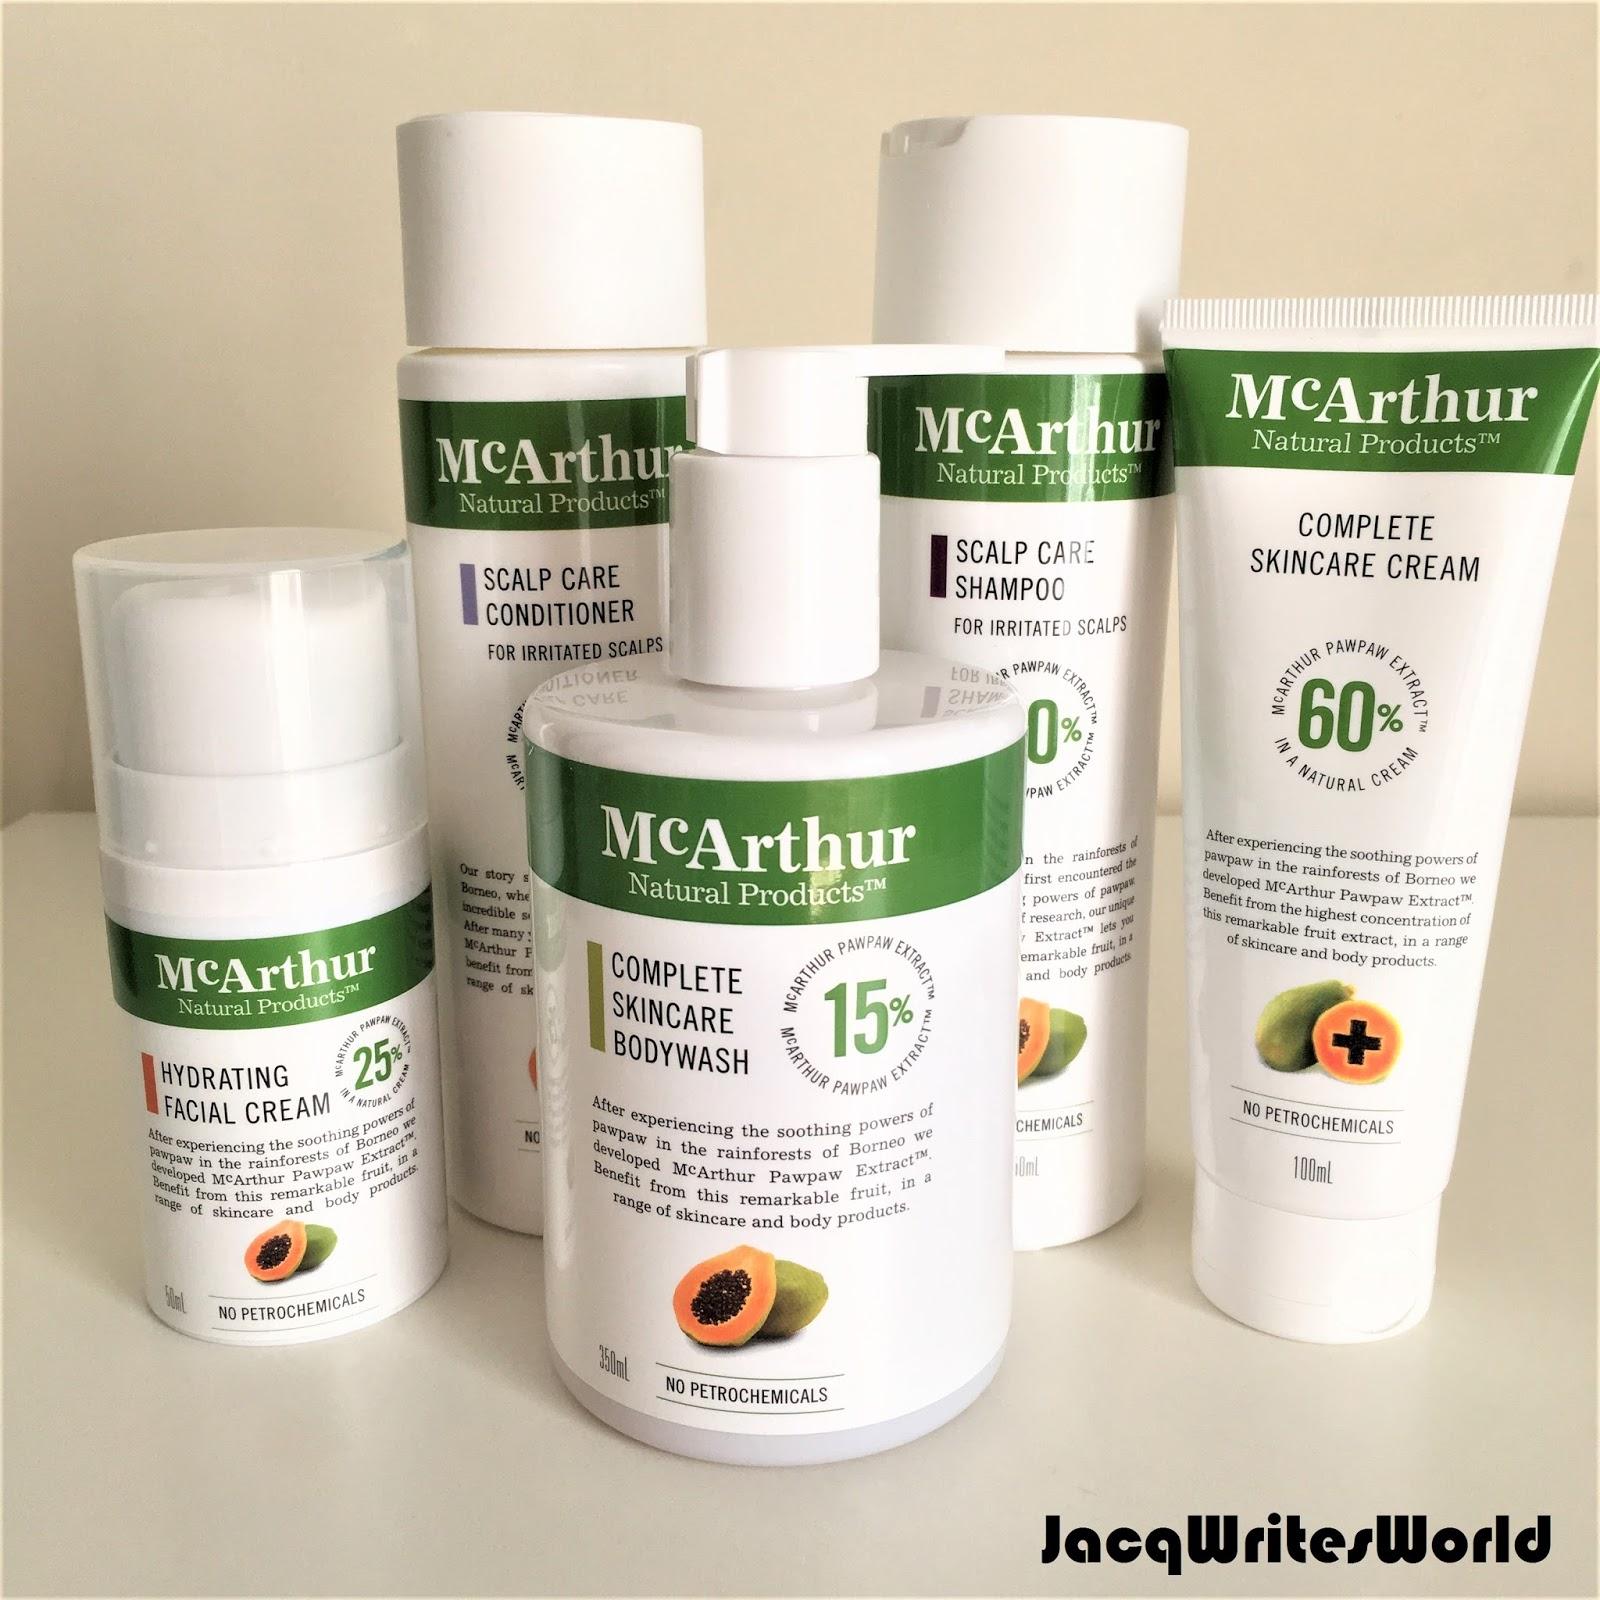 Mcarthur Natural Products Perth